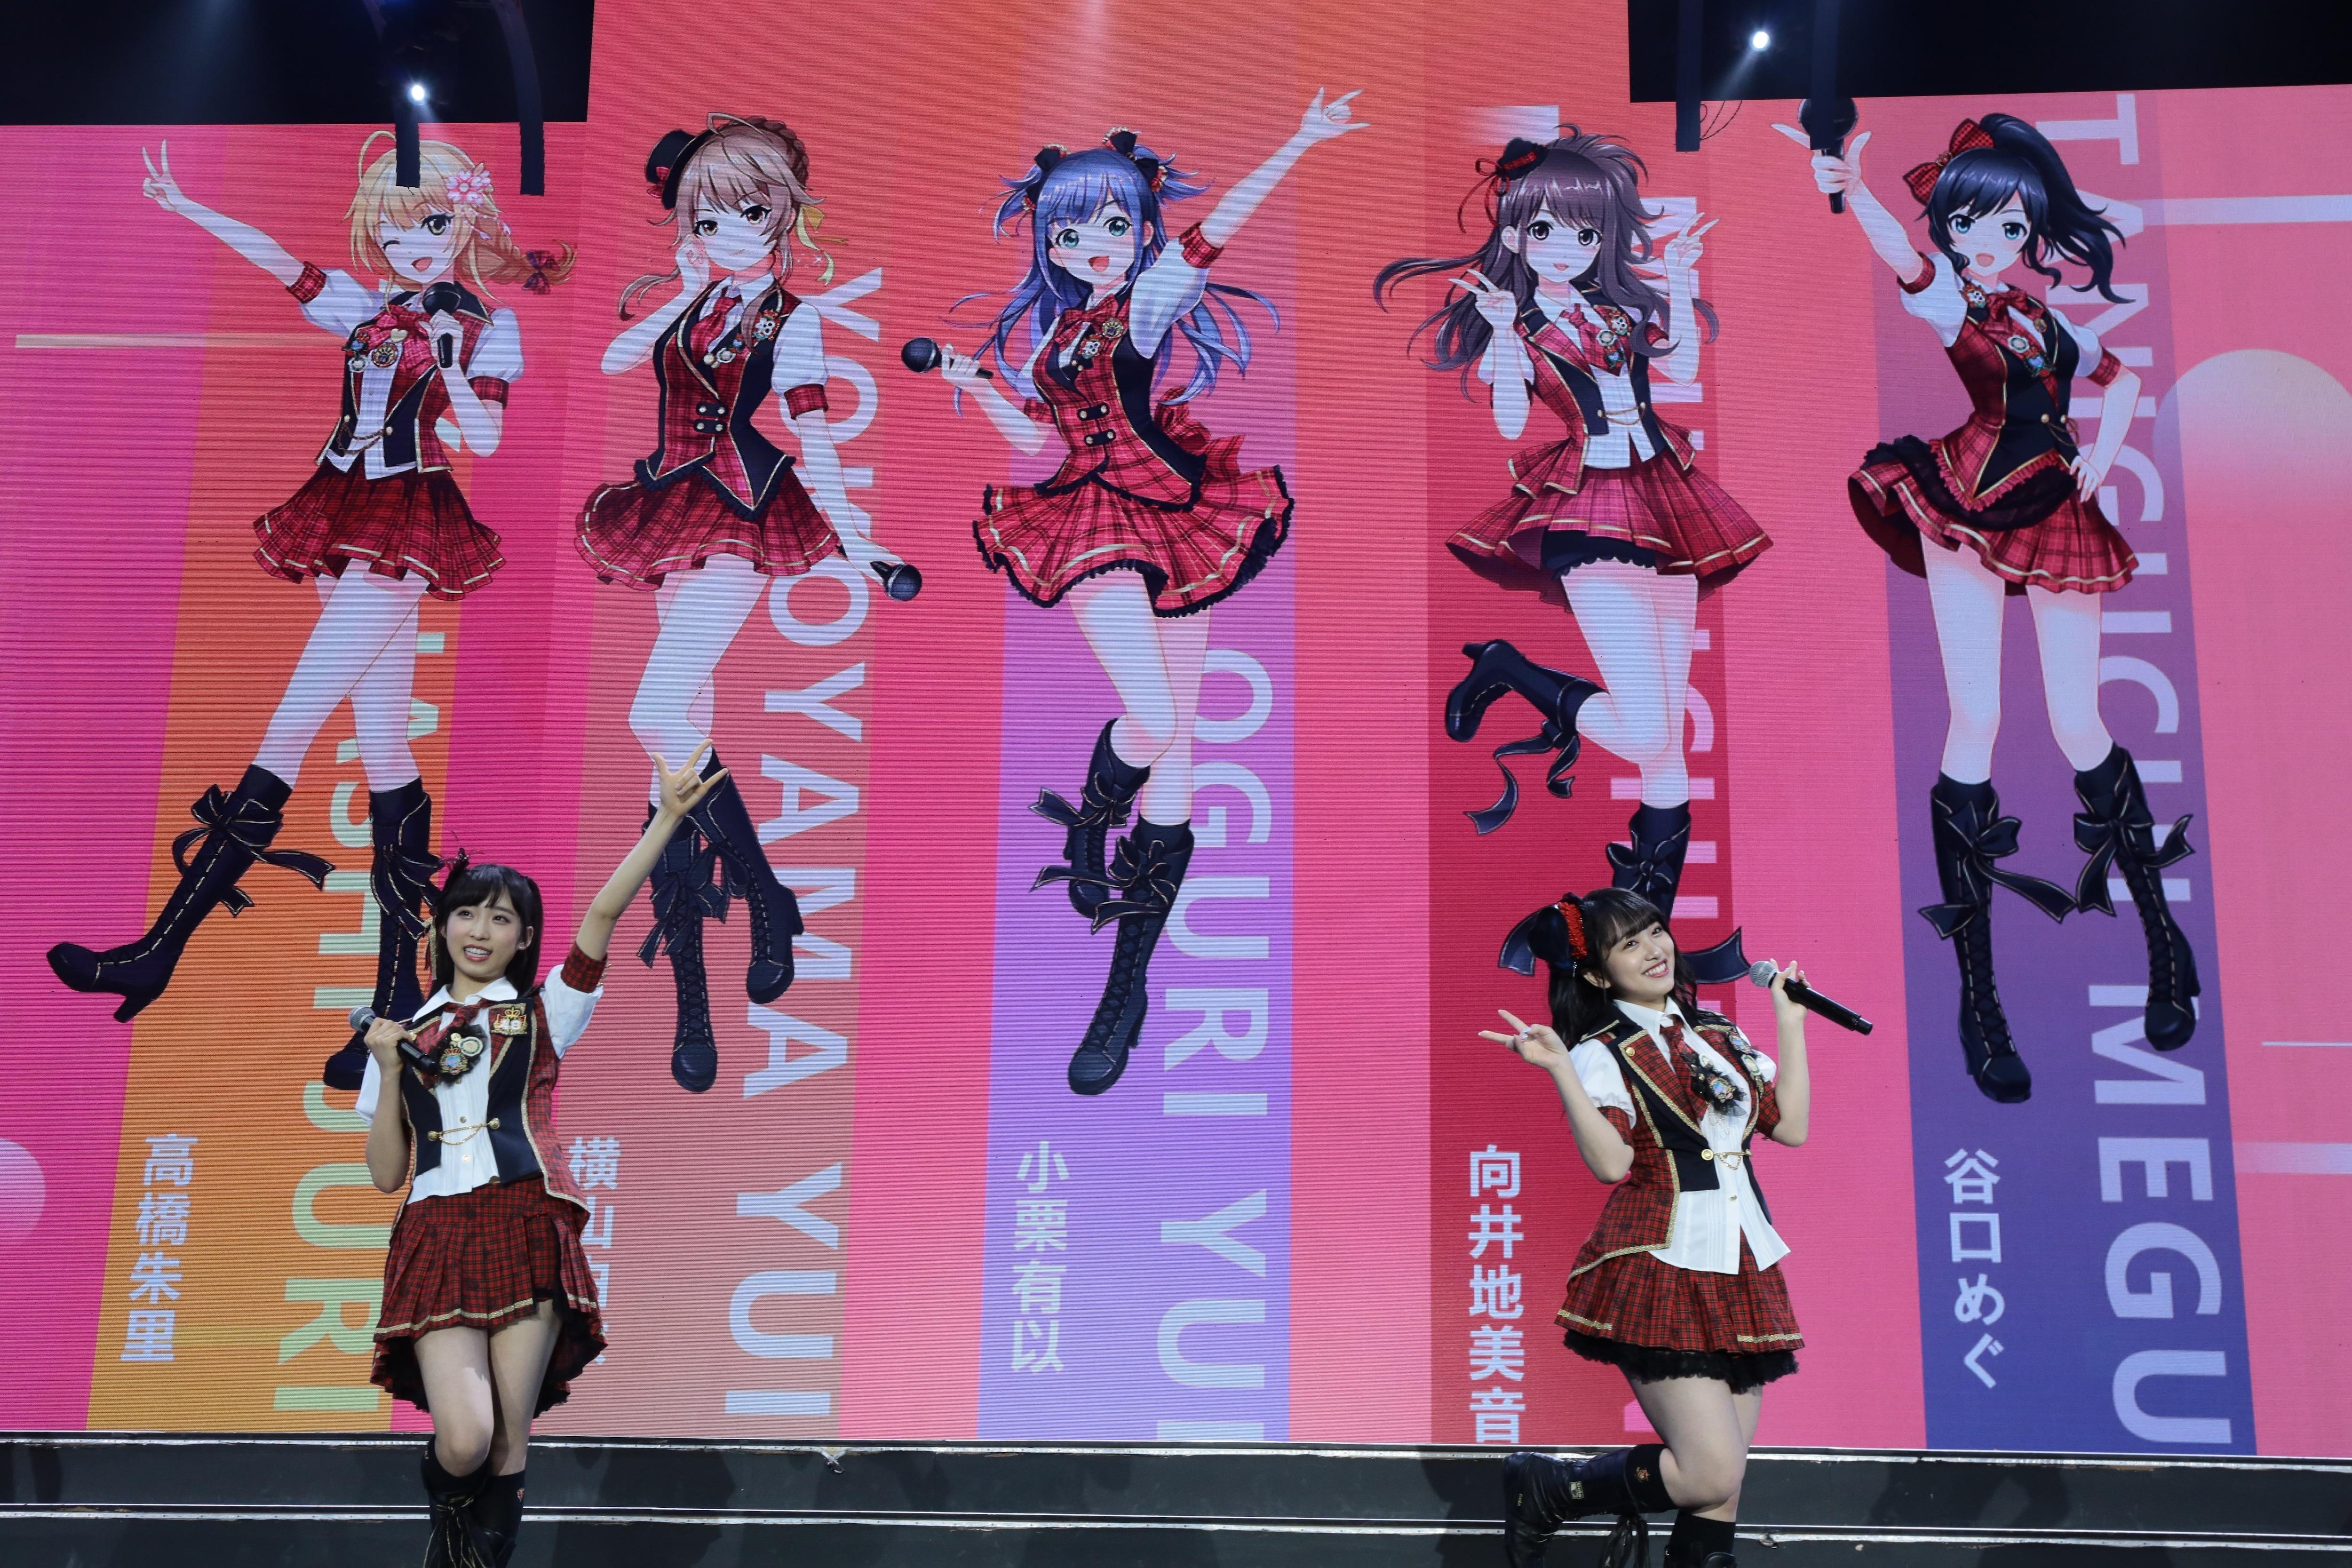 AKB48ほか、海外の姉妹グループが集結し『恋するフォーチュンクッキー』を熱唱!【写真23枚】の画像014